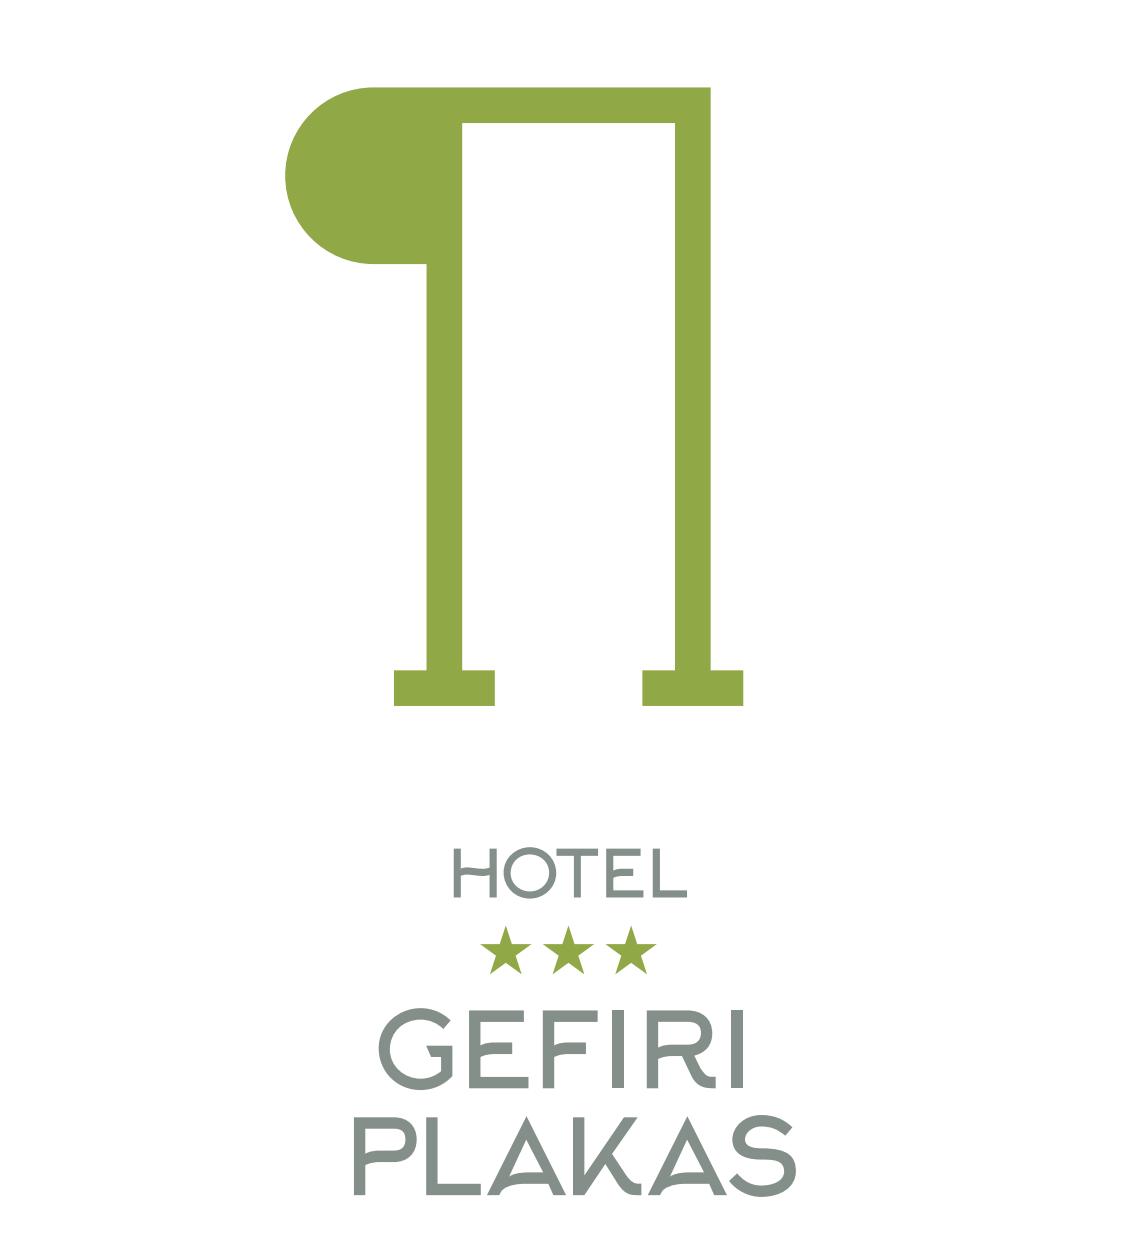 plakas_logo